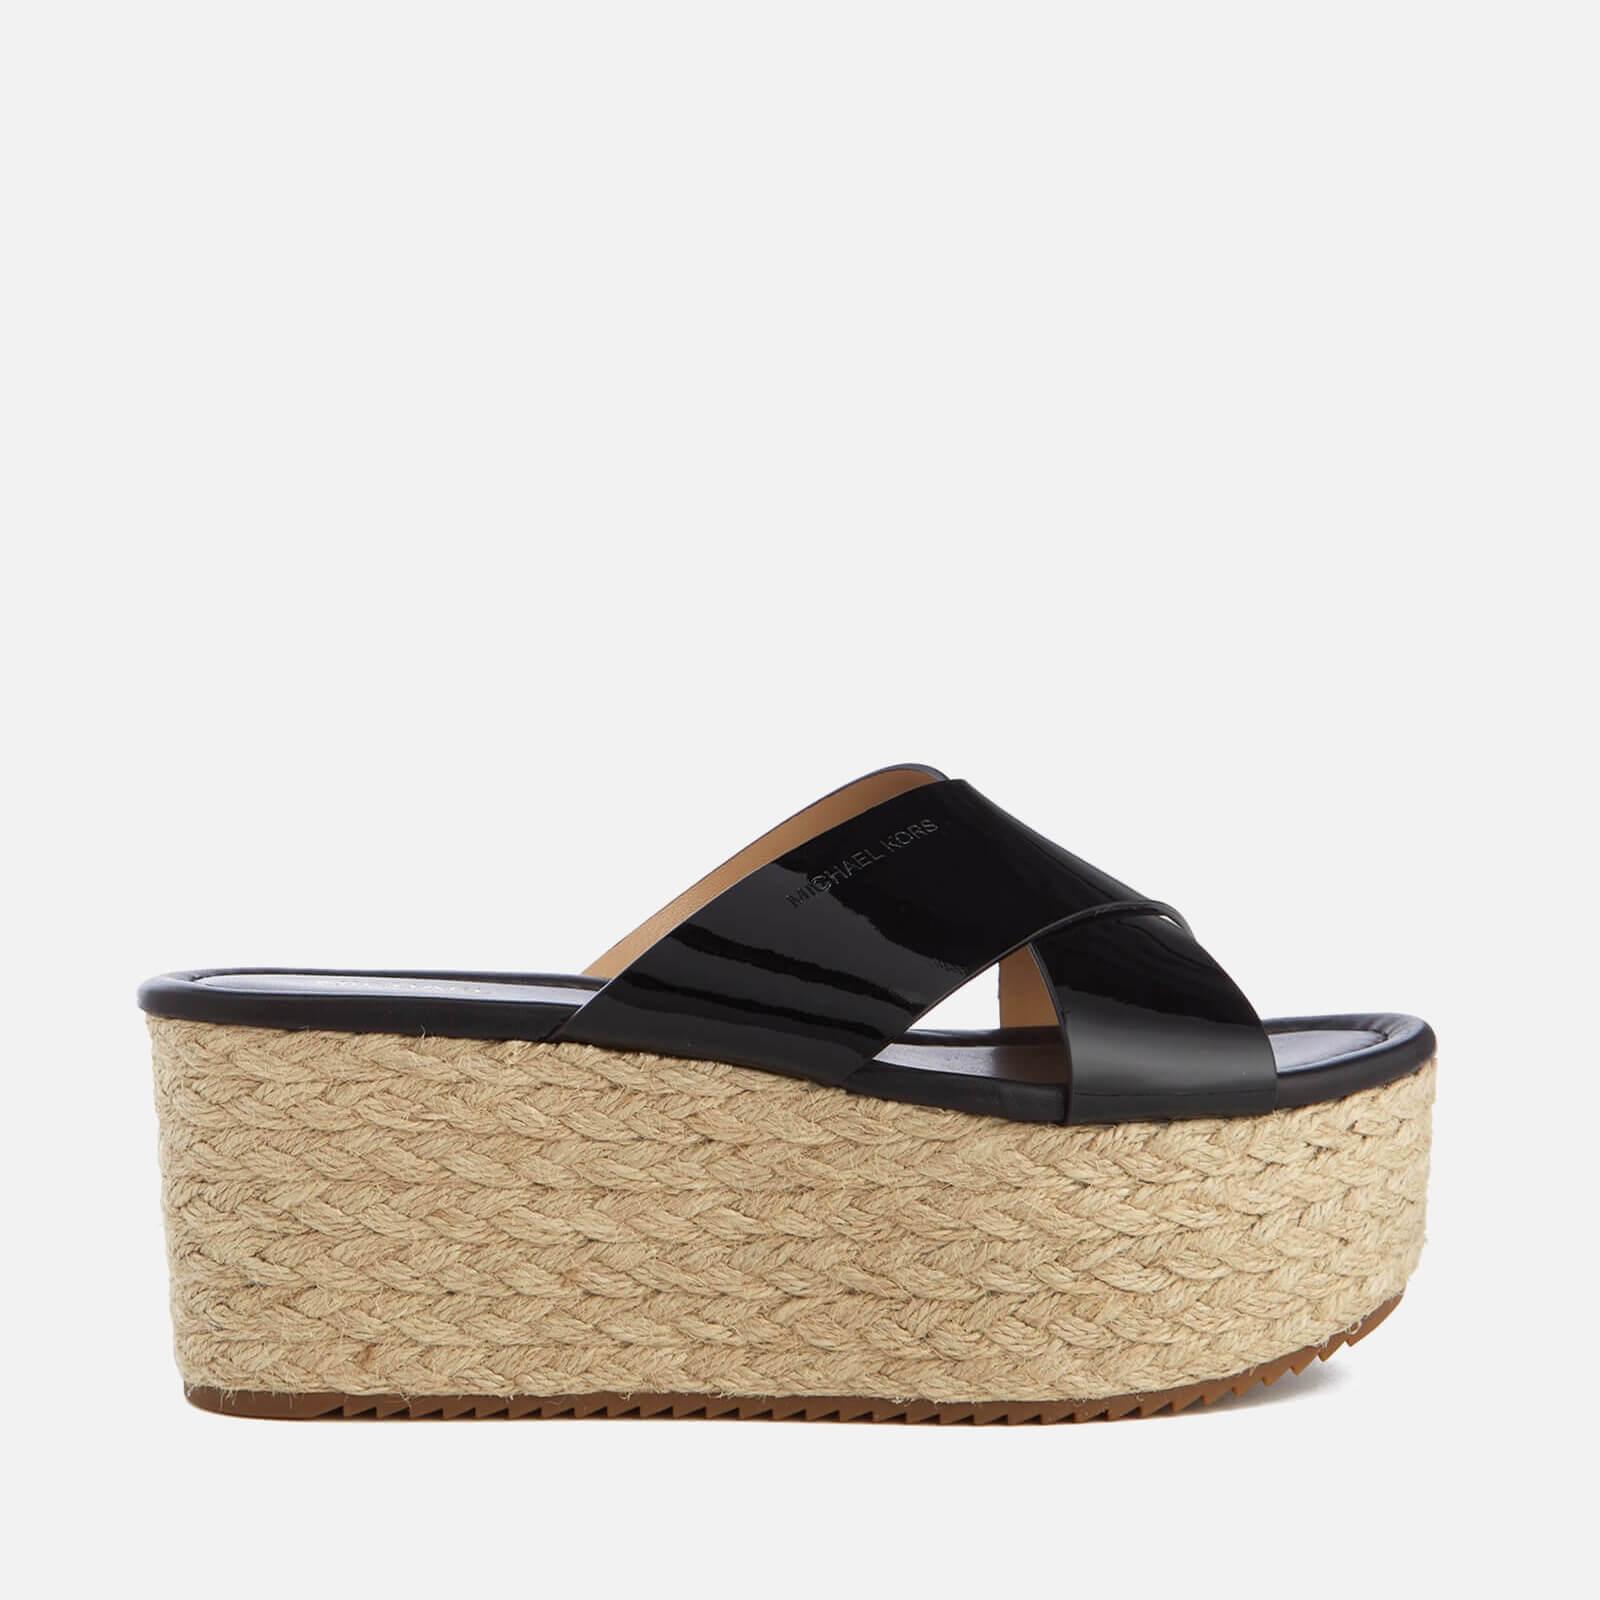 9f11950c923 MICHAEL MICHAEL KORS Women's Vivianna Slide Wedged Sandals - Black Patent